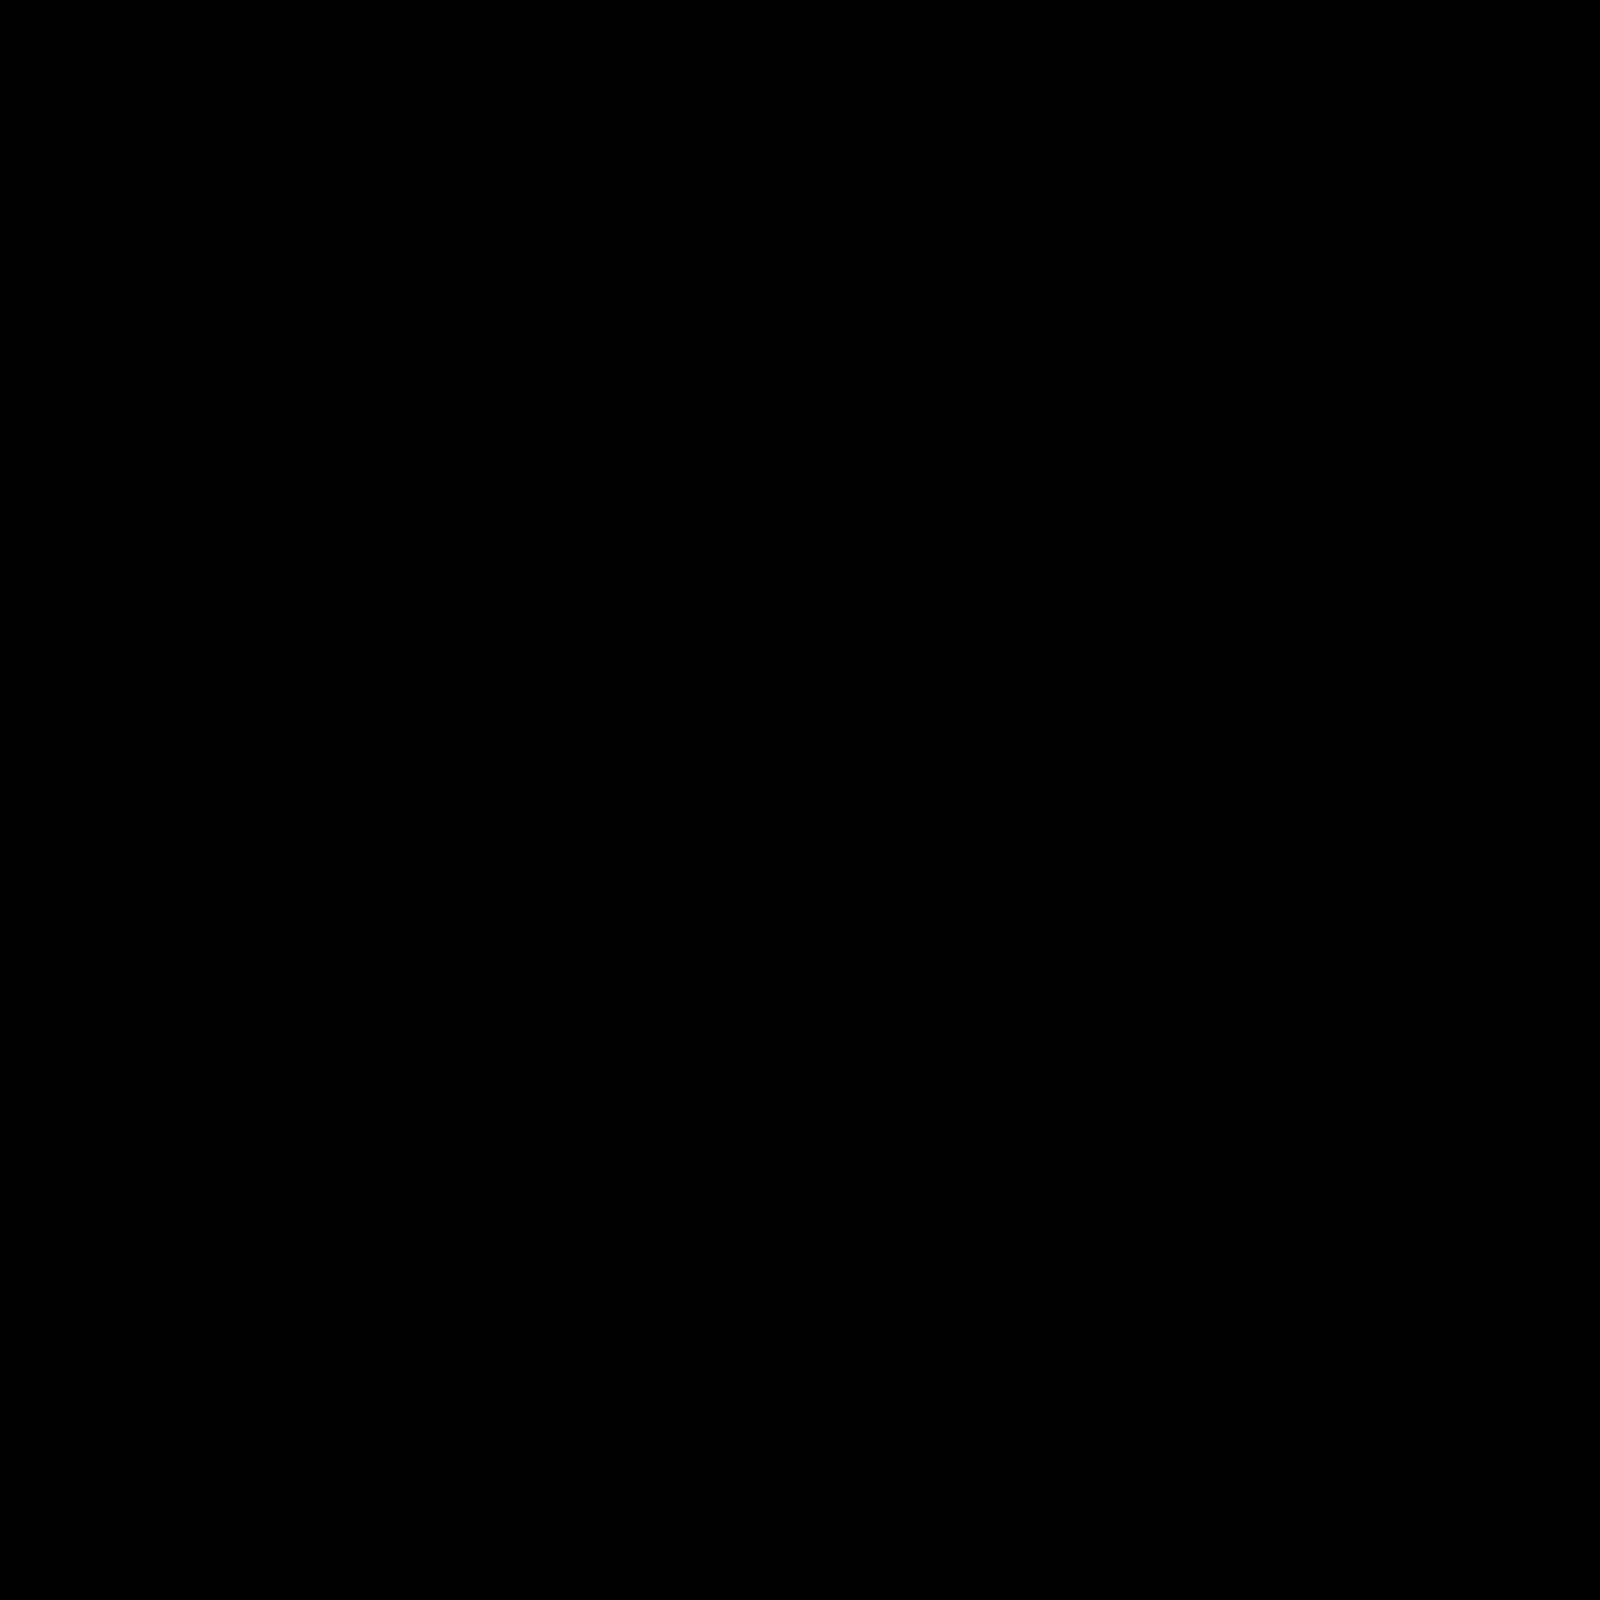 Backup danych icon